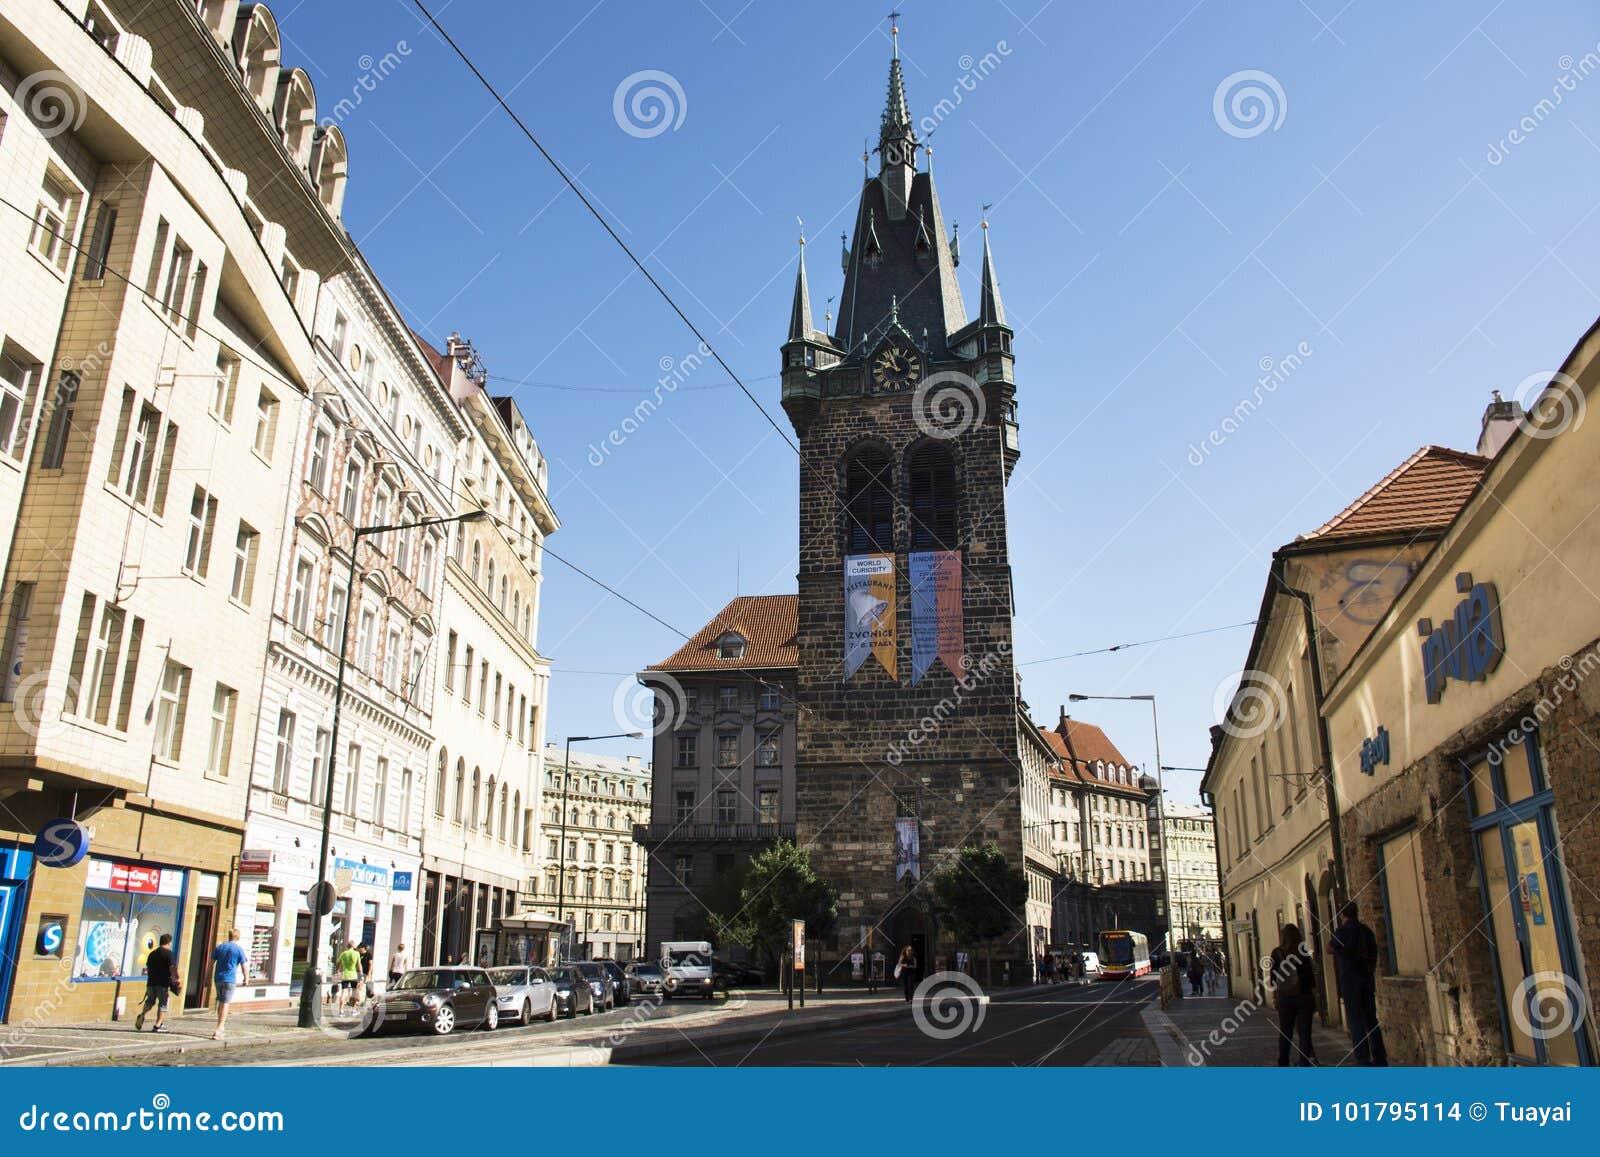 Czechia人和走外国人的旅客和参观亨利` s钟楼或者Jindrisska塔